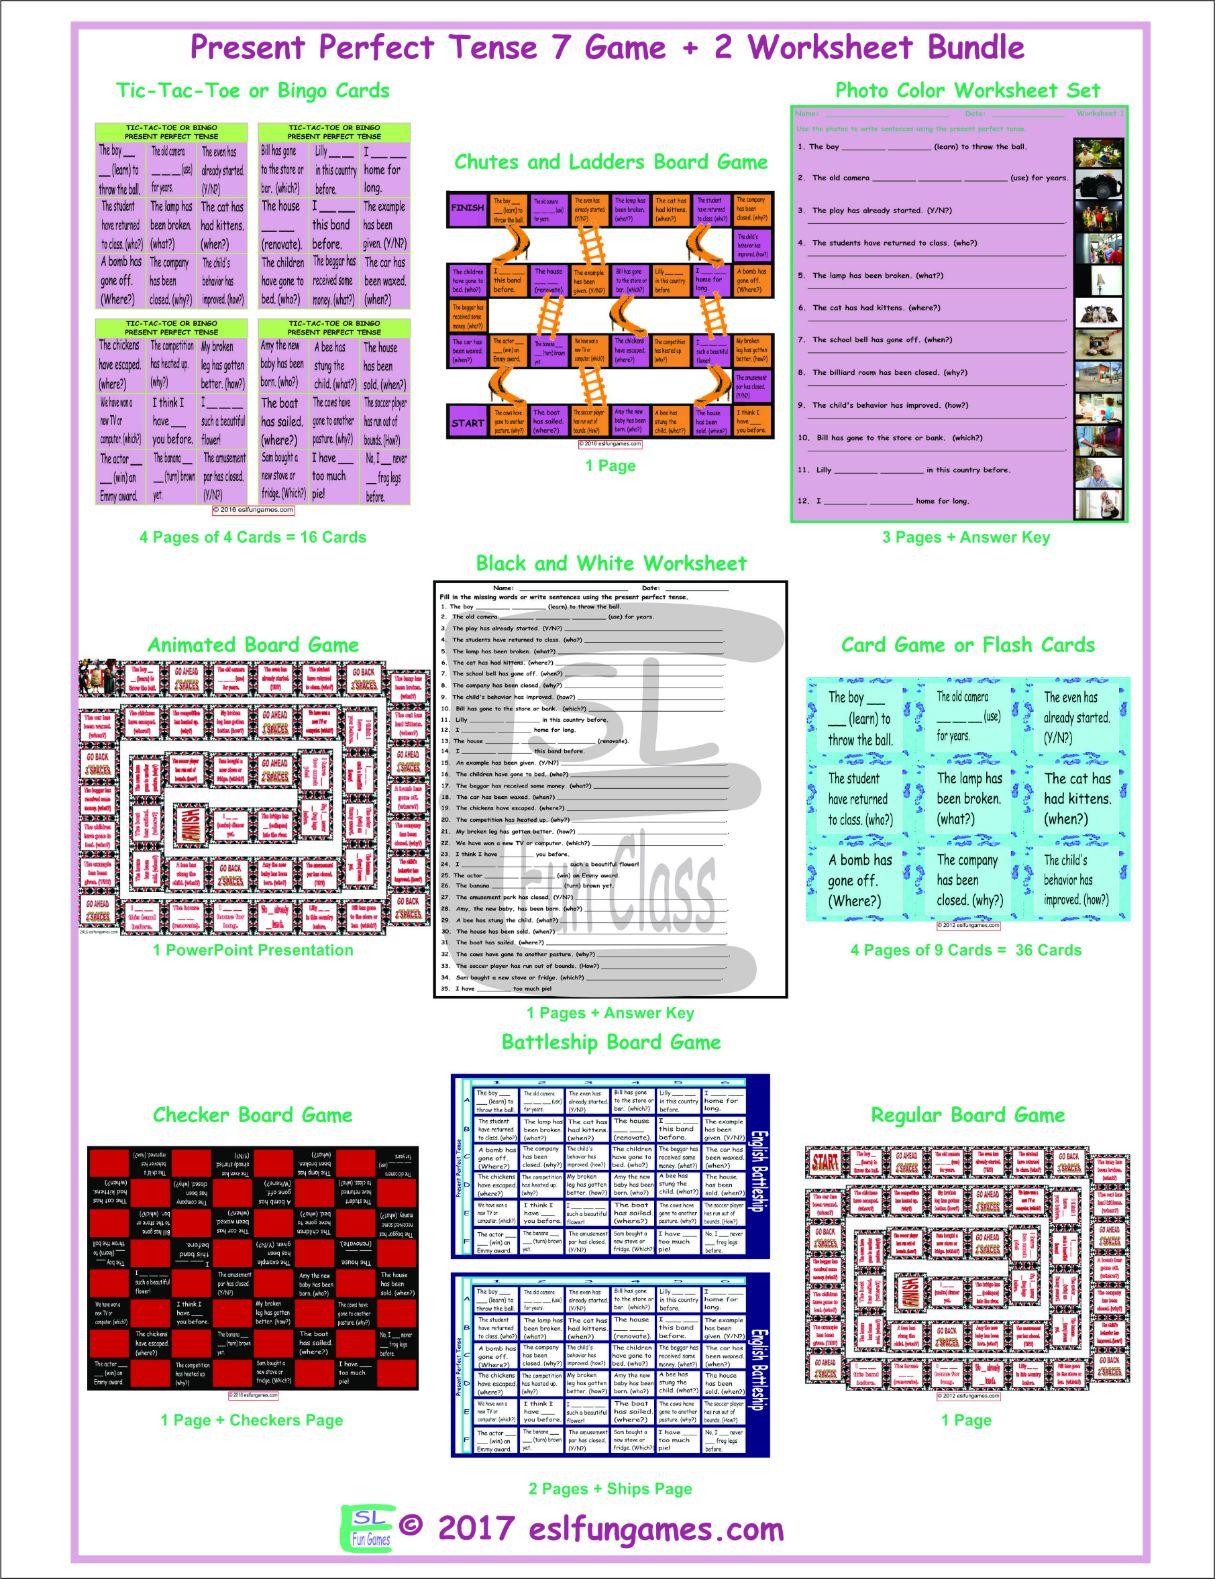 Present Perfect Tense 7 Game Plus 2 Worksheet Bundle